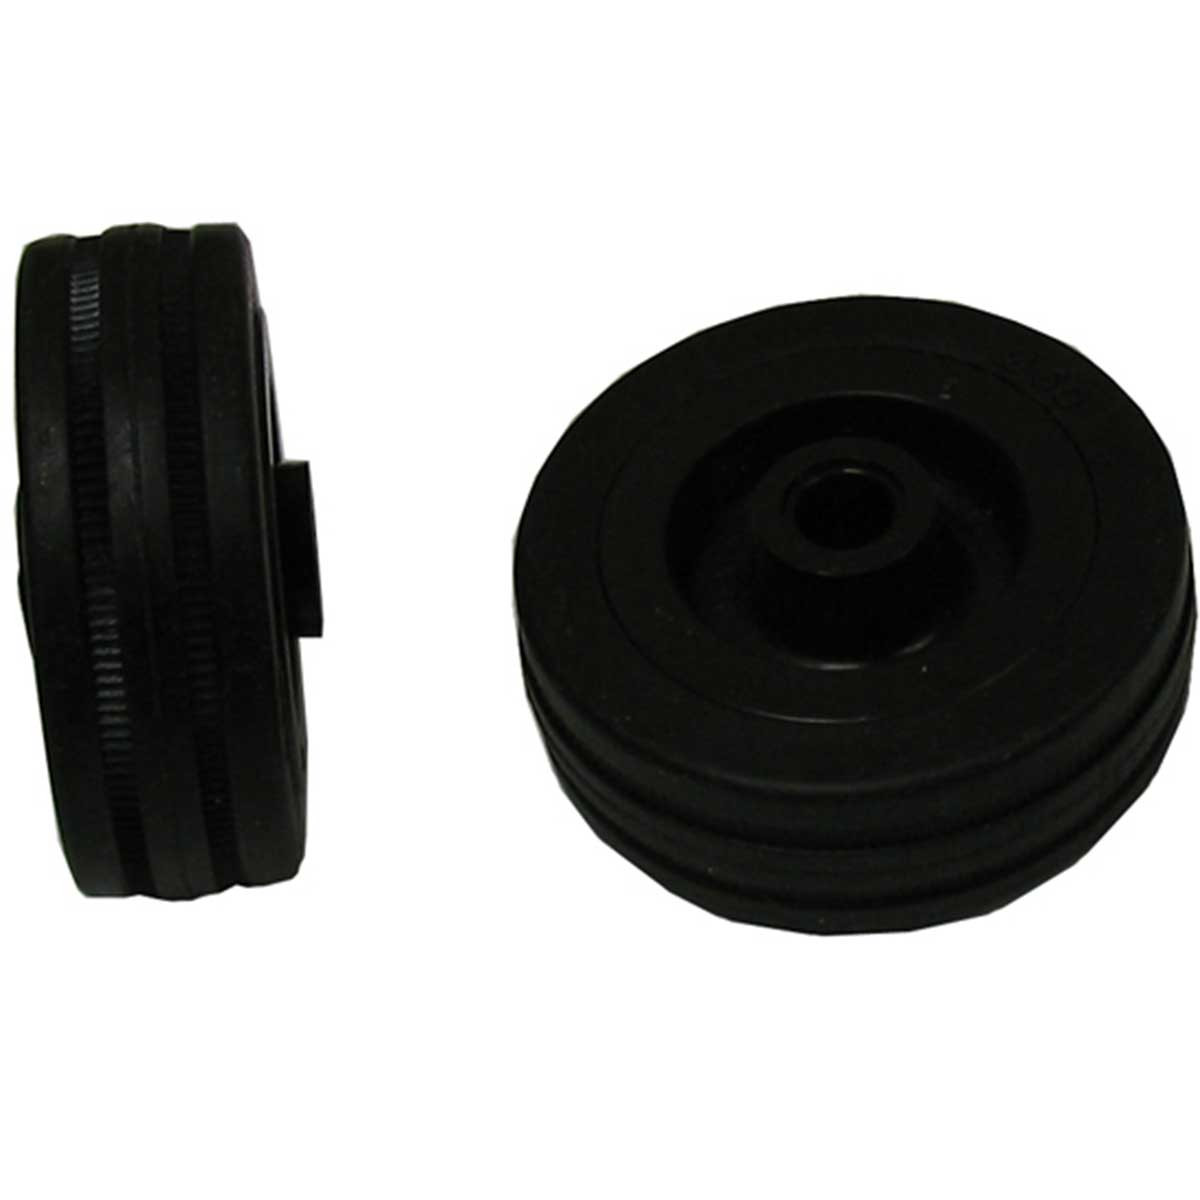 Replc. wheels Pro wash bucket